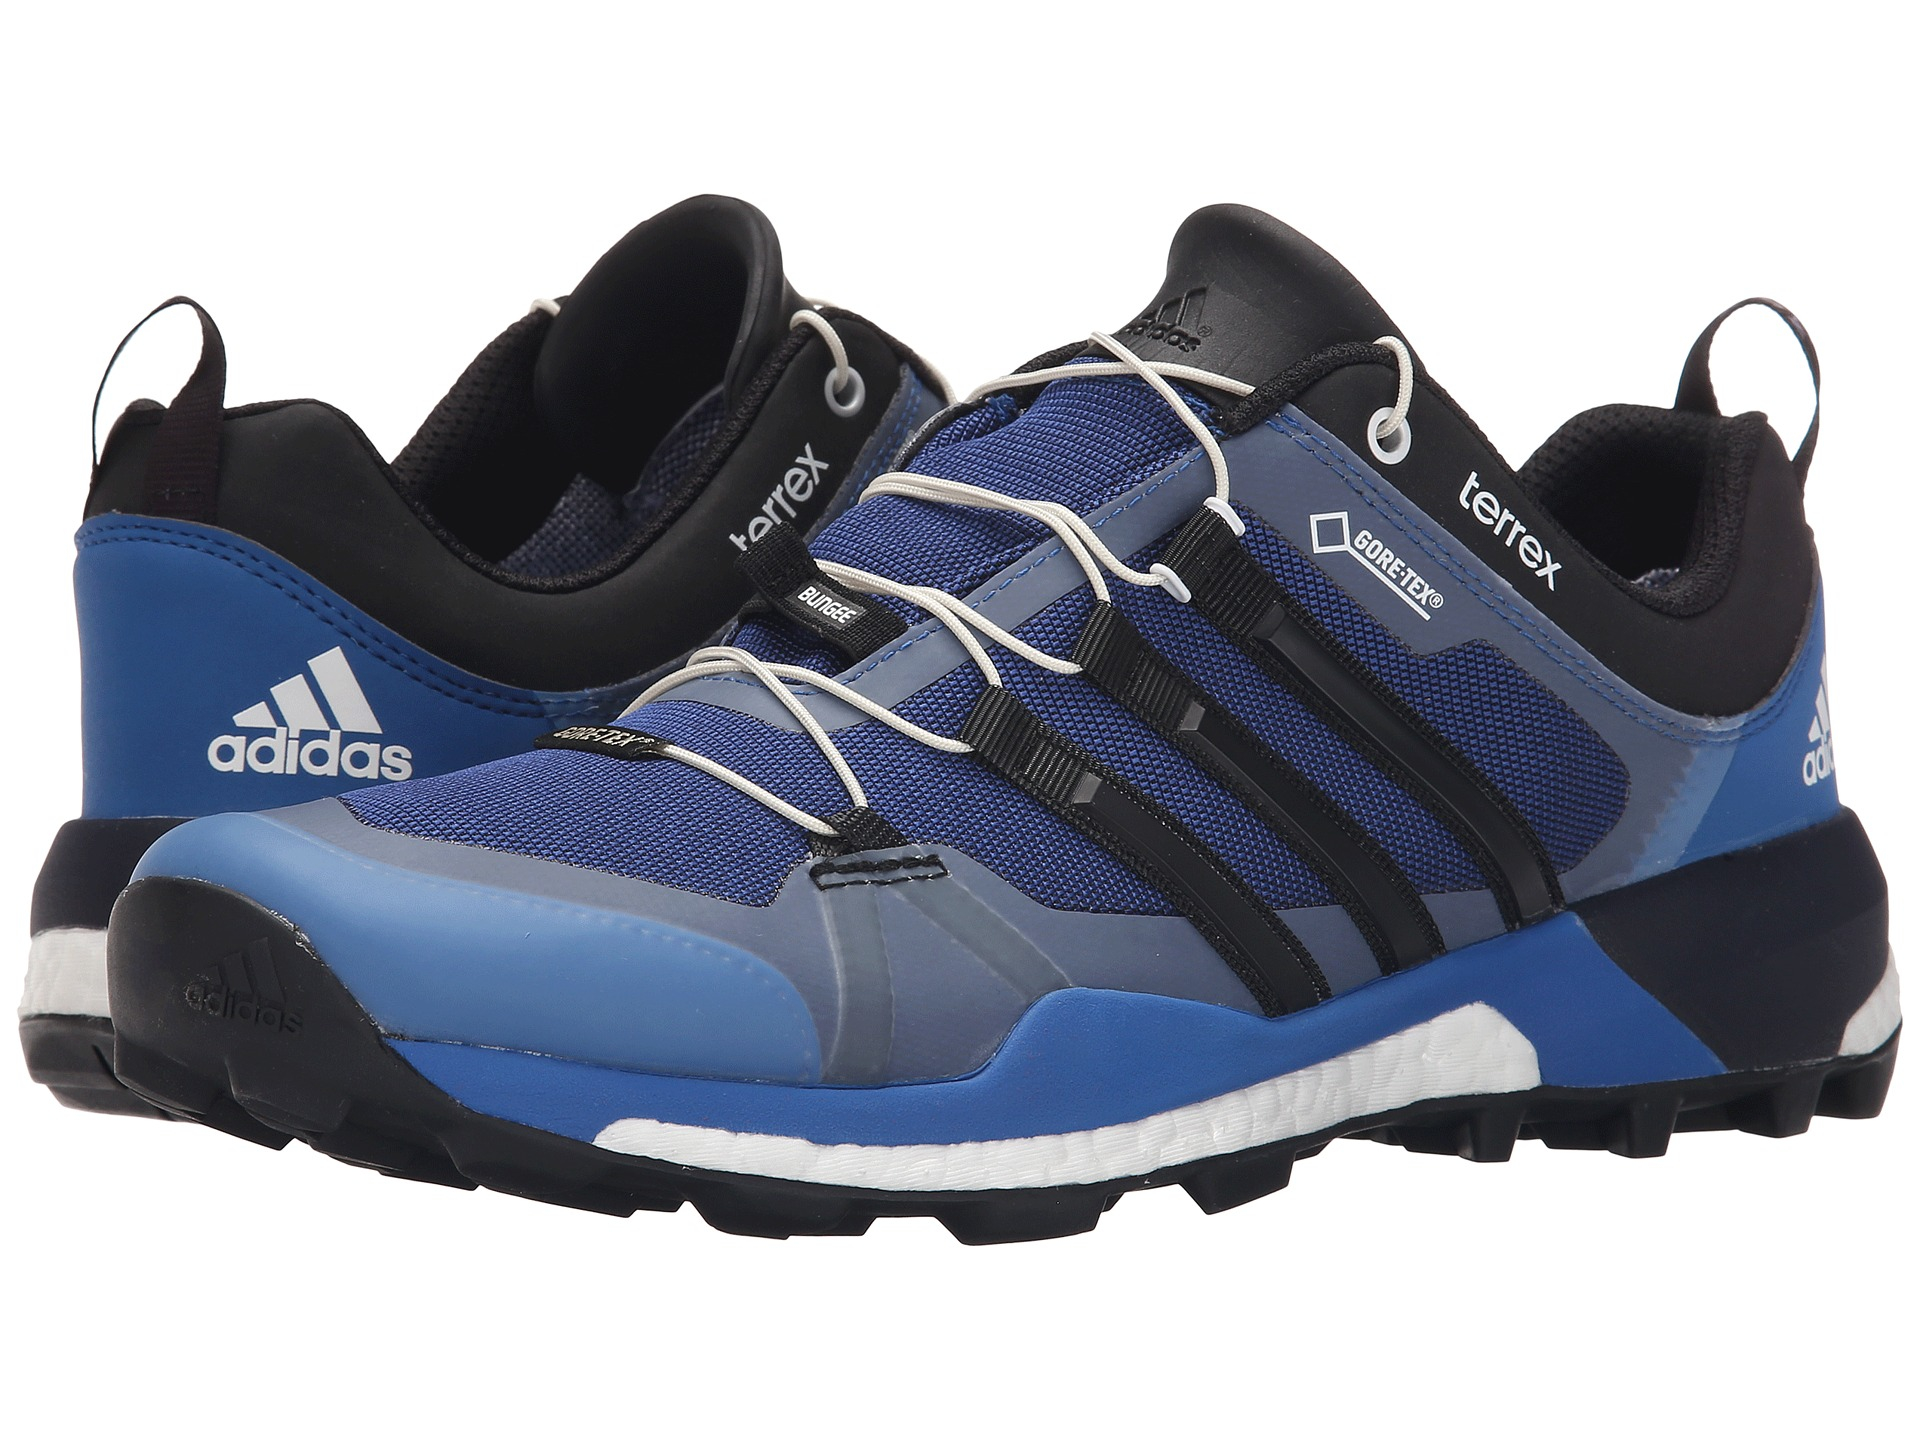 Gtx® Adidas In Originals For Terrex Blue Men Lyst Boost dIaBXwnIq 543f5e2aec611